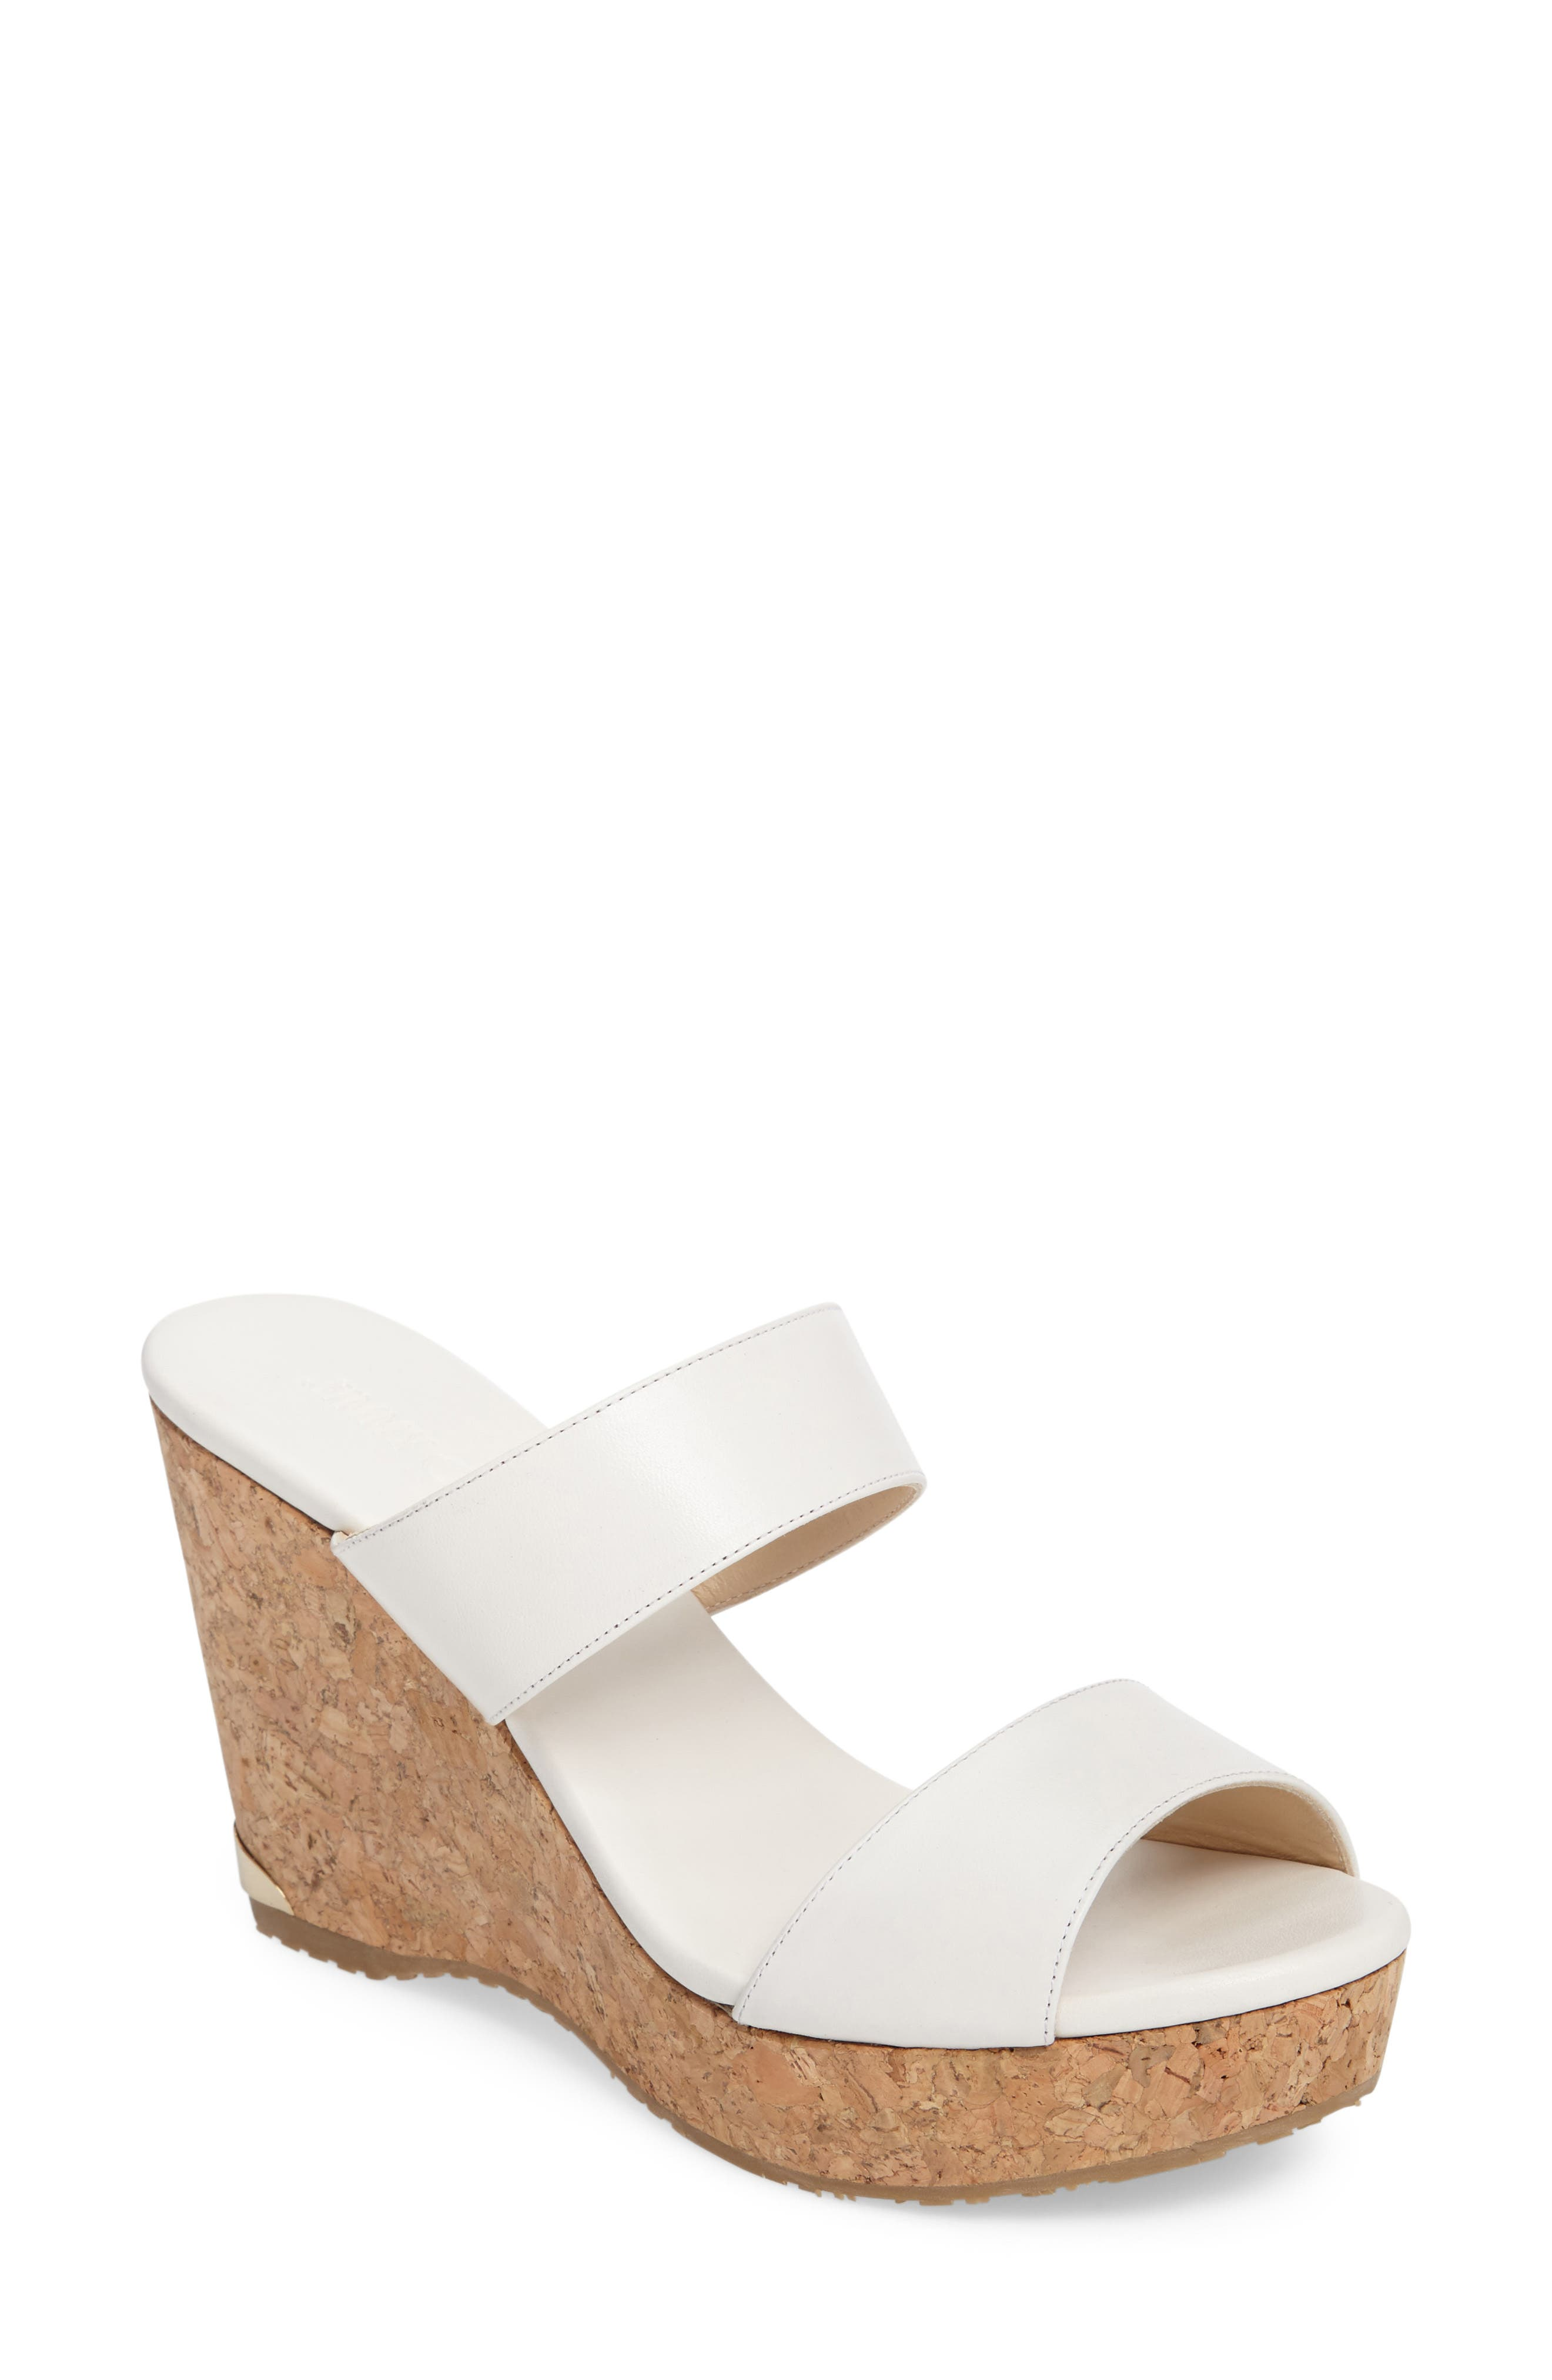 Parker Wedge Sandal,                         Main,                         color,